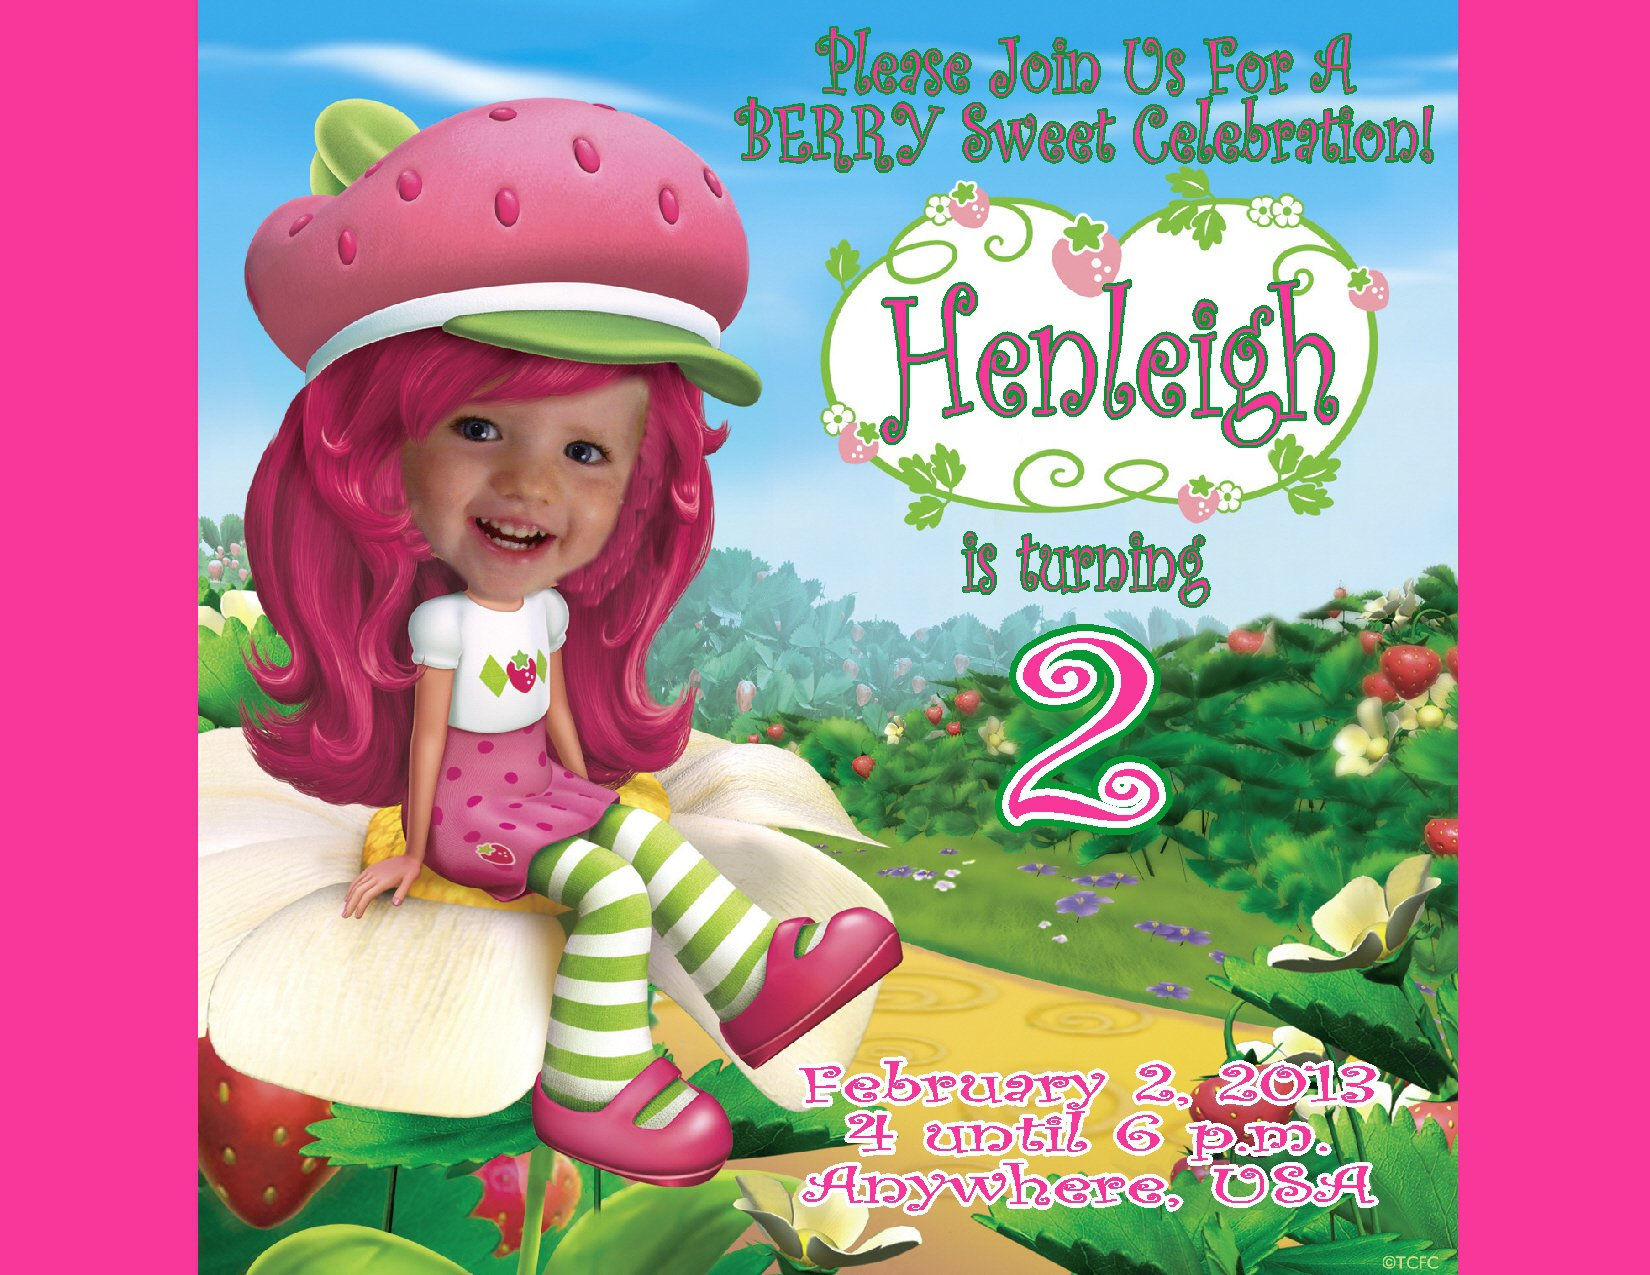 Personalized Tinkerbell Birthday Invitations Gallery - Invitation ...